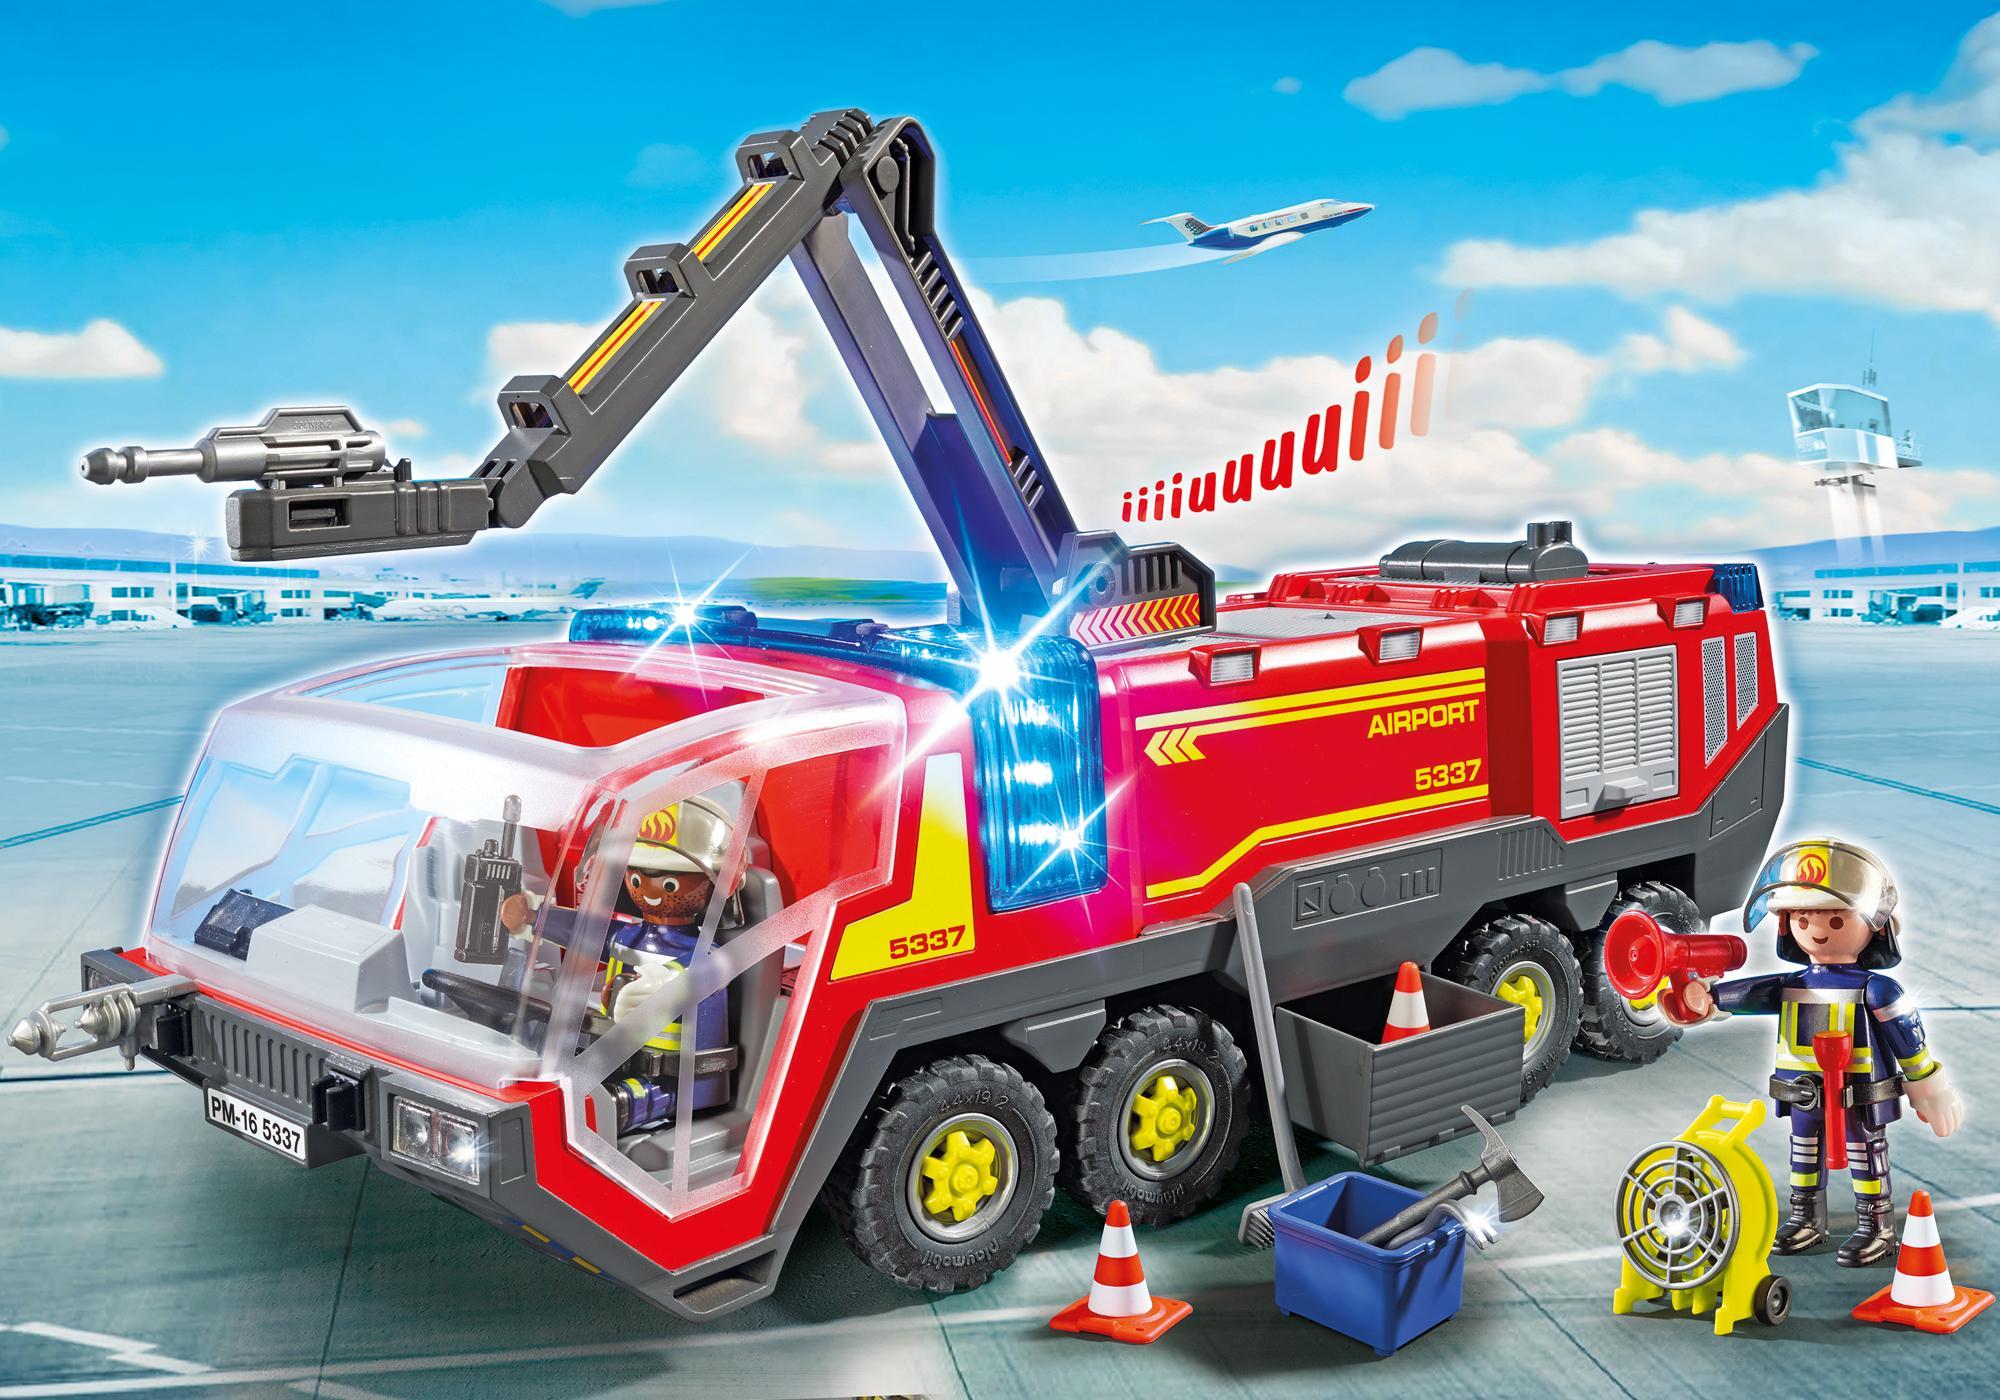 http://media.playmobil.com/i/playmobil/5337_product_detail/Mezzo antincendio dell'aeroporto